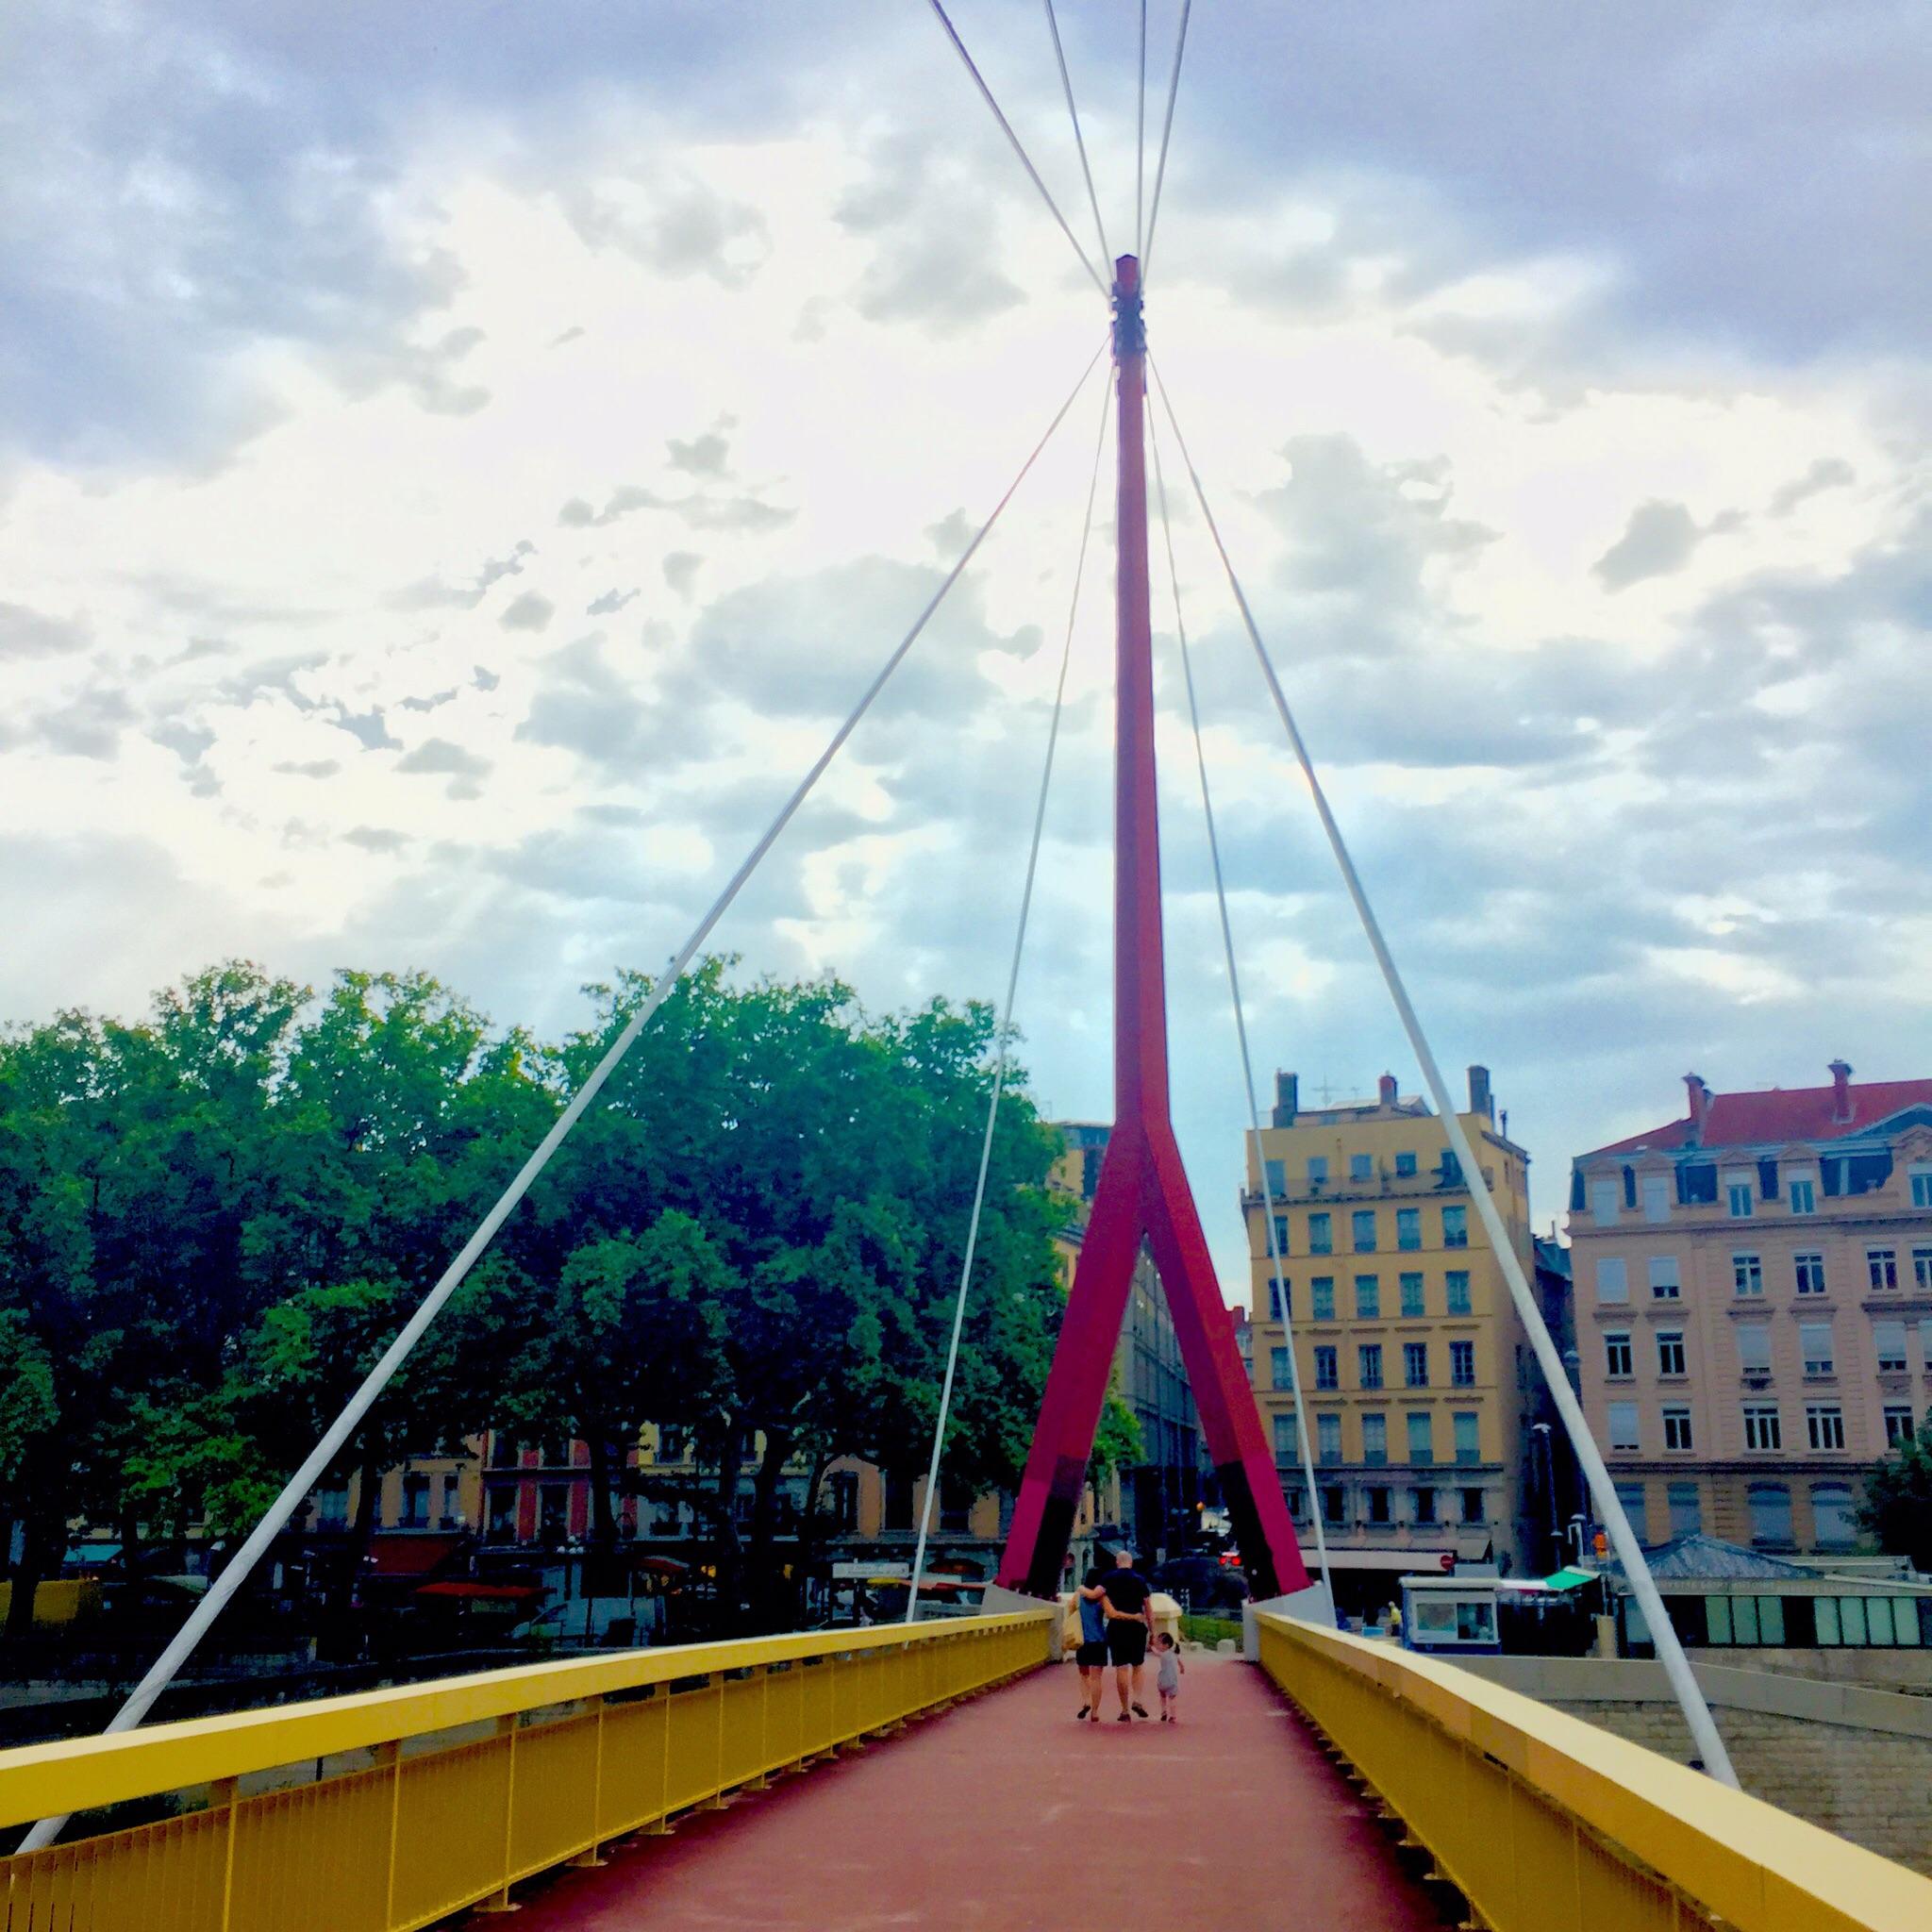 Pedestrian bridge (passerelle) to the Quai Saint Antoine, Lyon, where the daily outdoor market is held